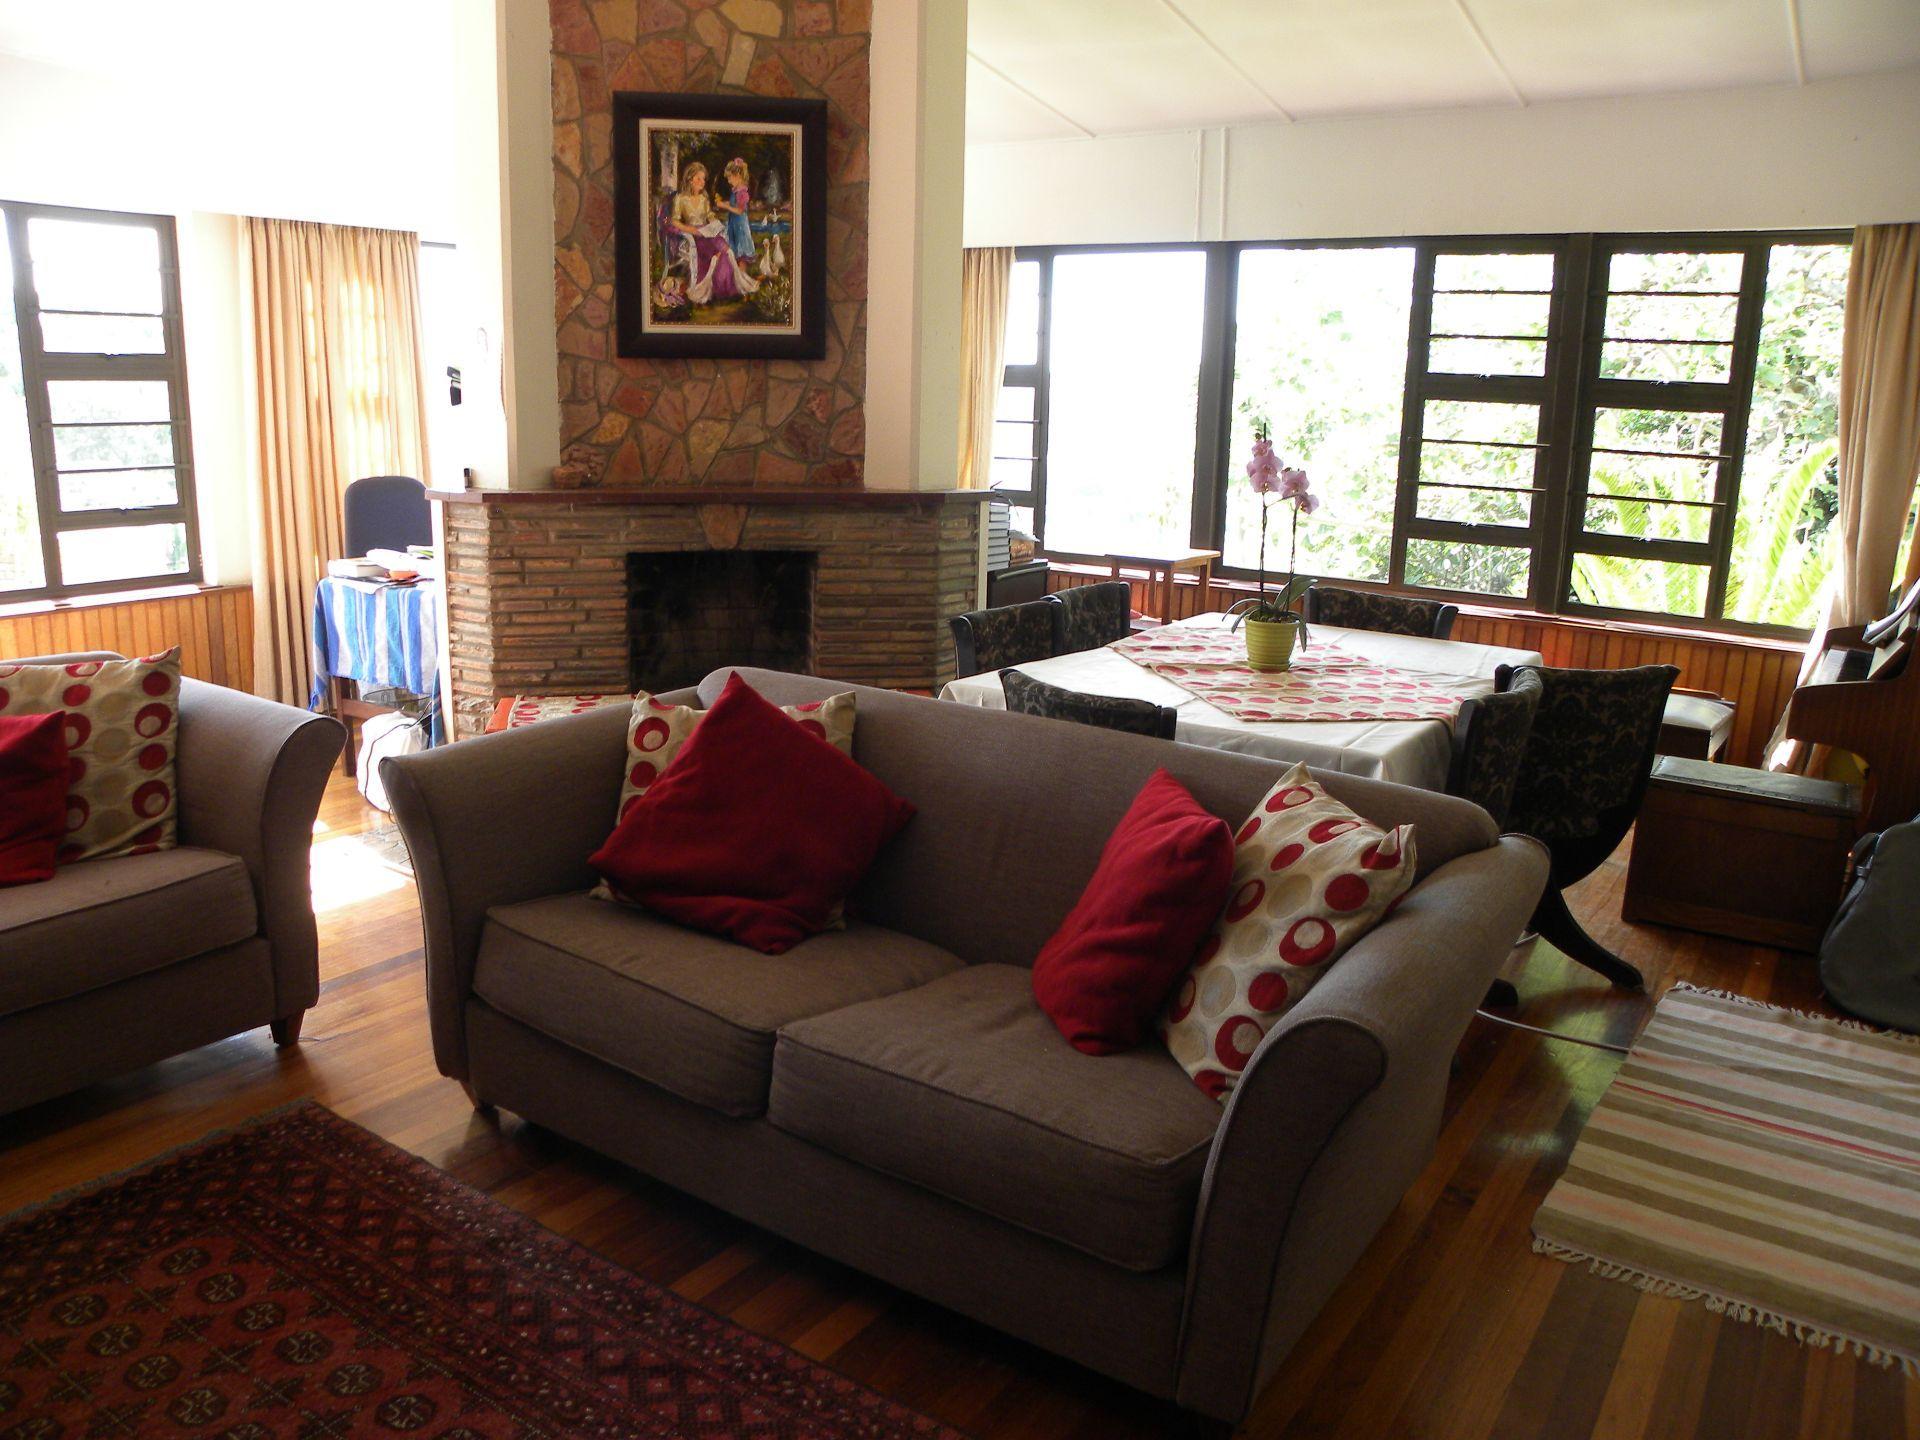 Bonnie Doone property for sale. Ref No: 13229687. Picture no 8